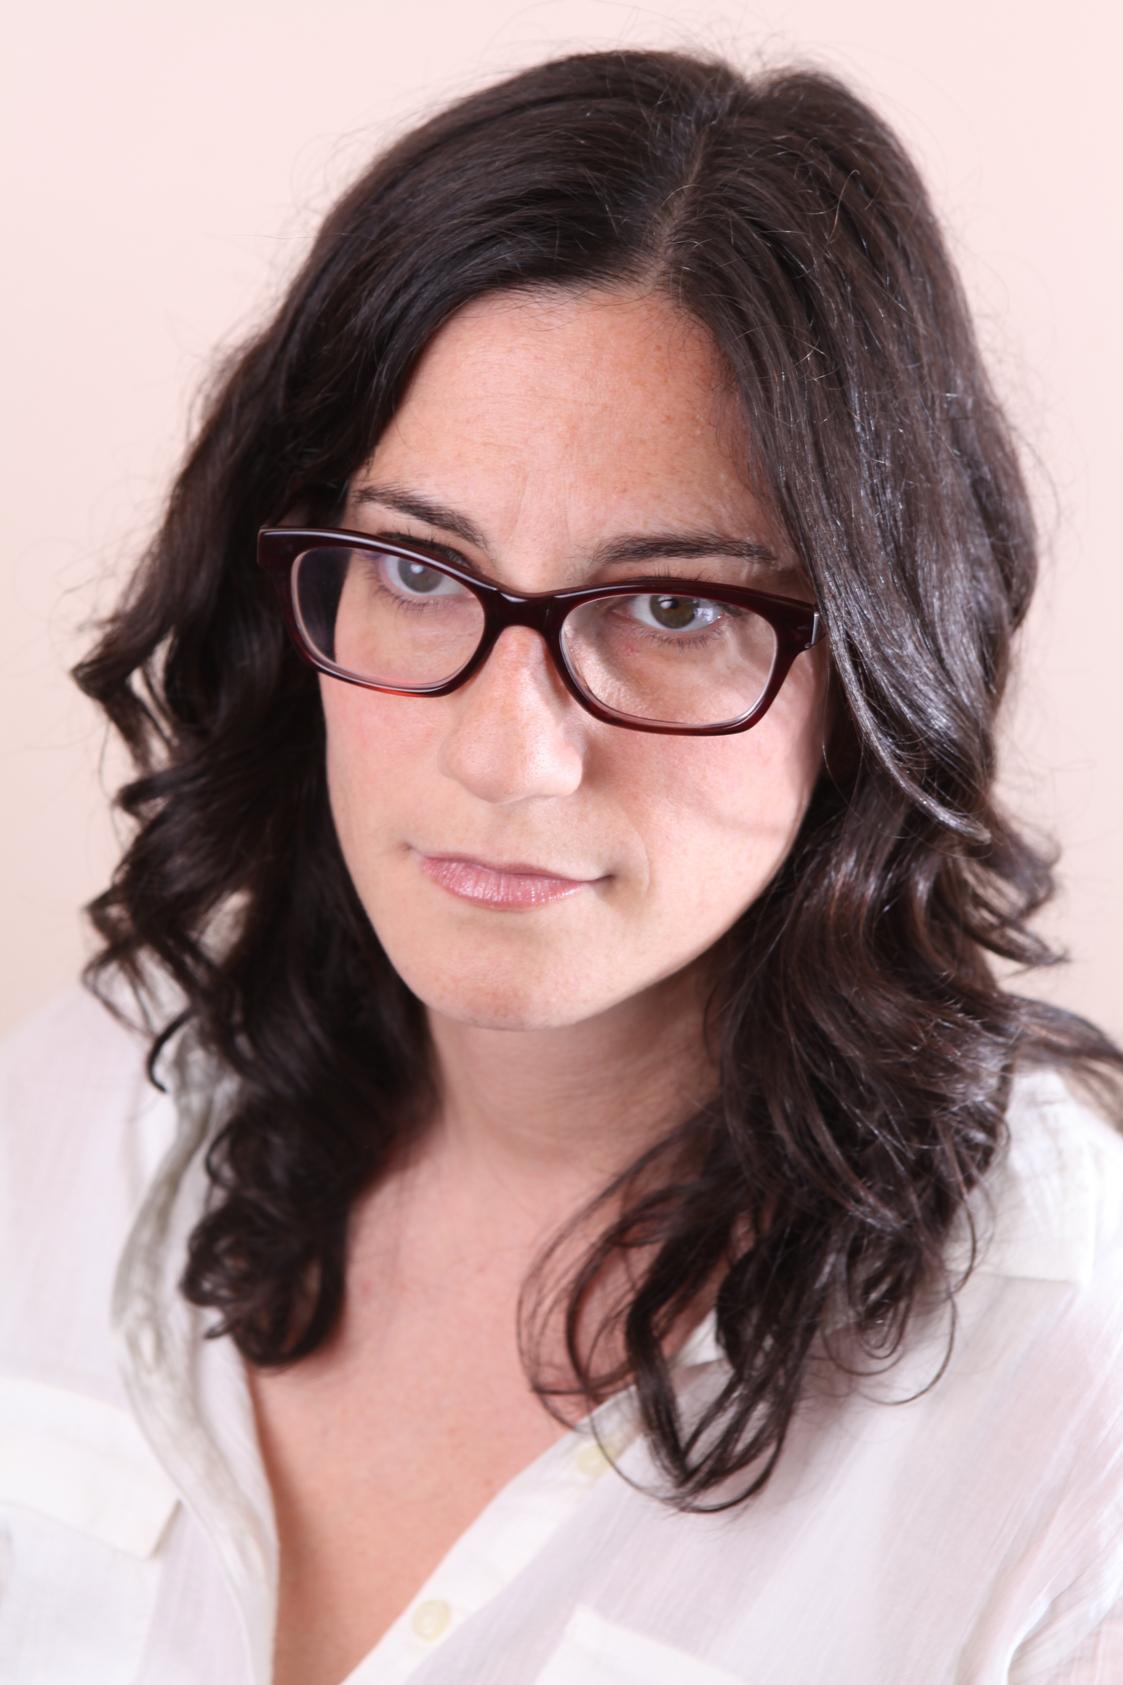 Rachel-Rosenthal-huang.jpg